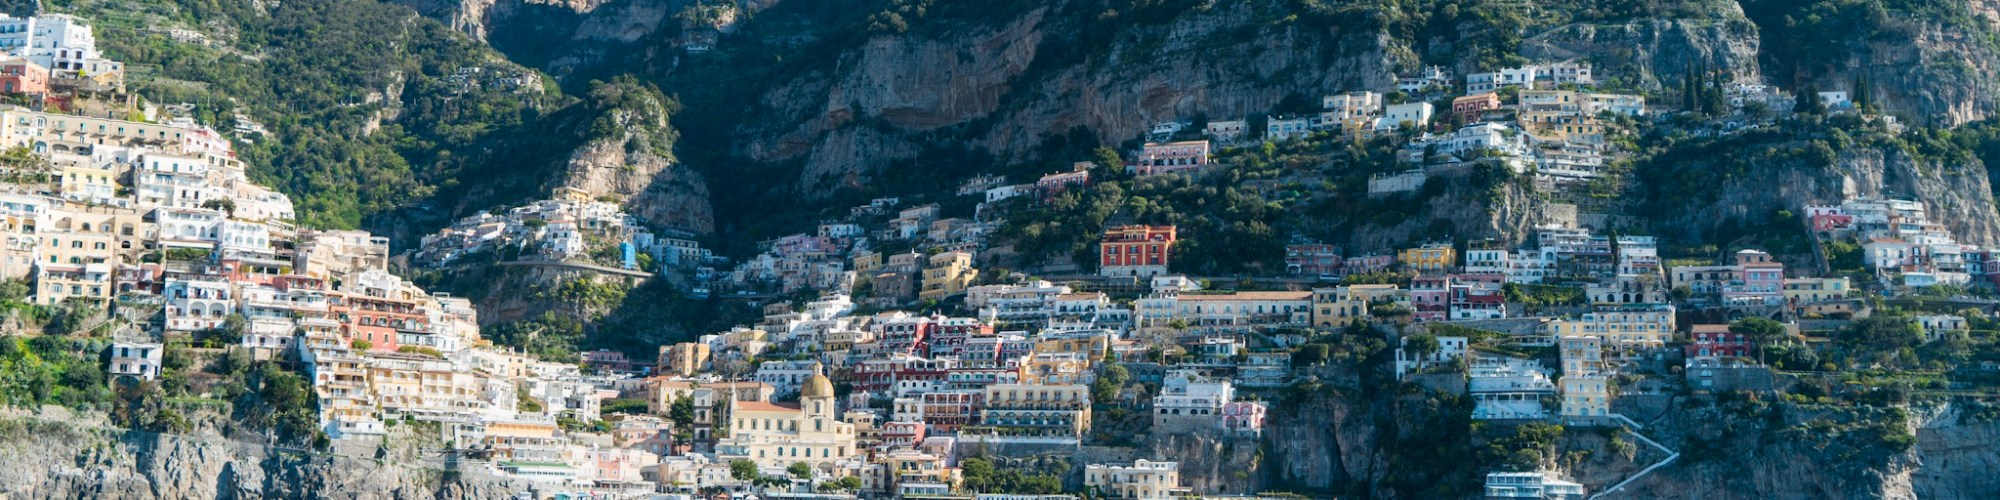 Italy Travel Guide: Positano